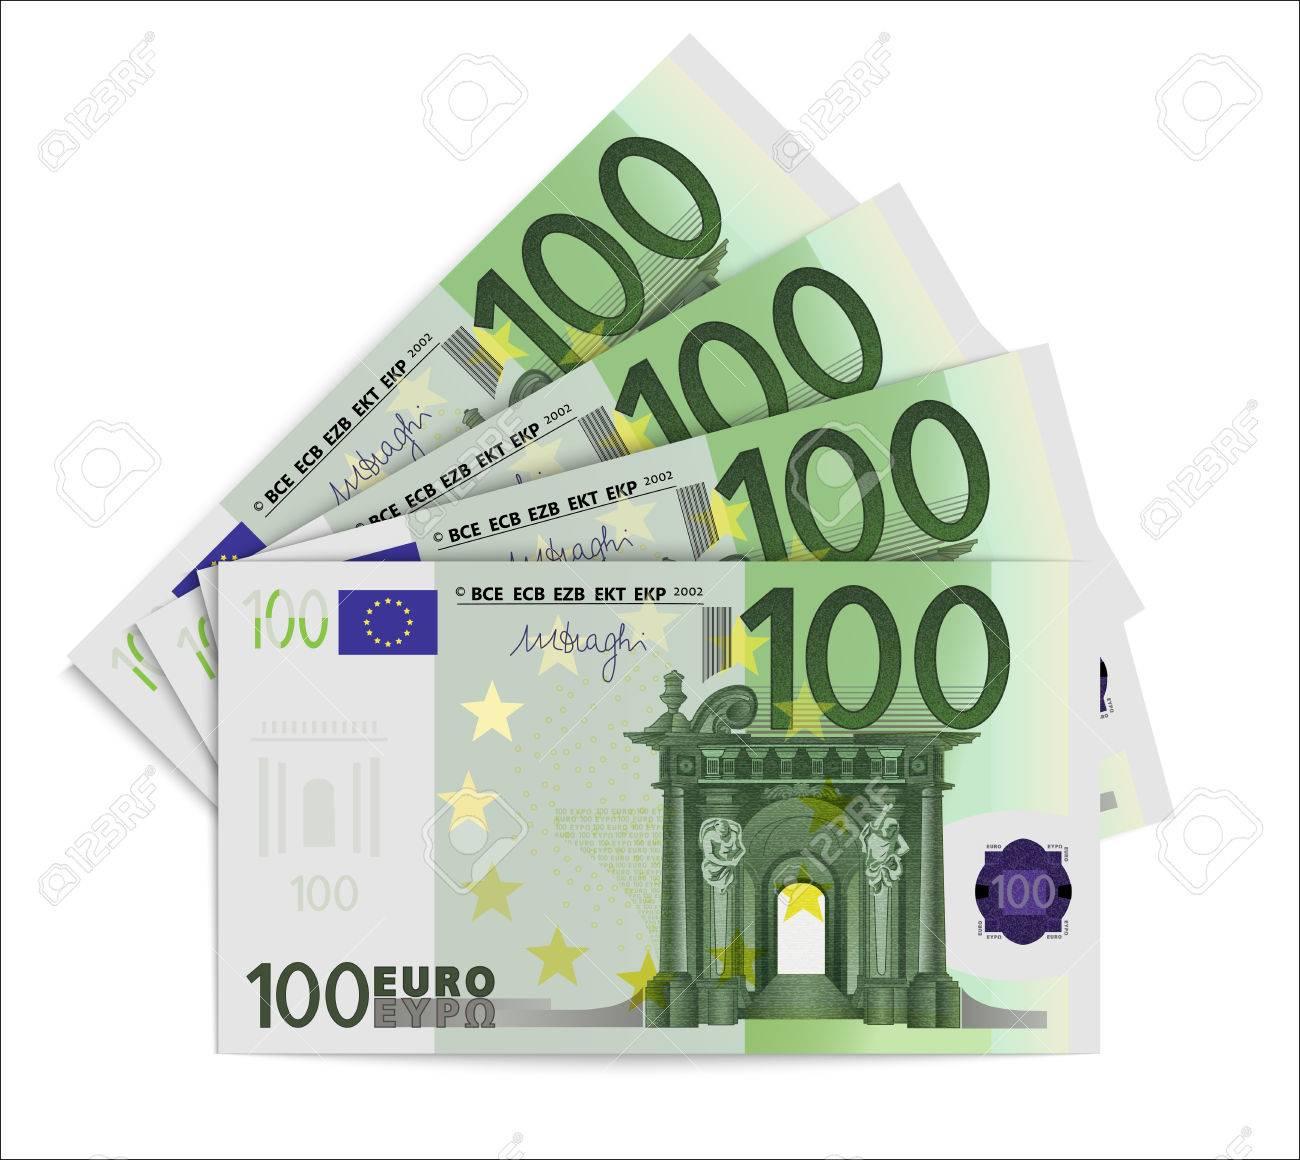 100 Euro Bills. One Hundred Euro Notes Isolated On White Background.